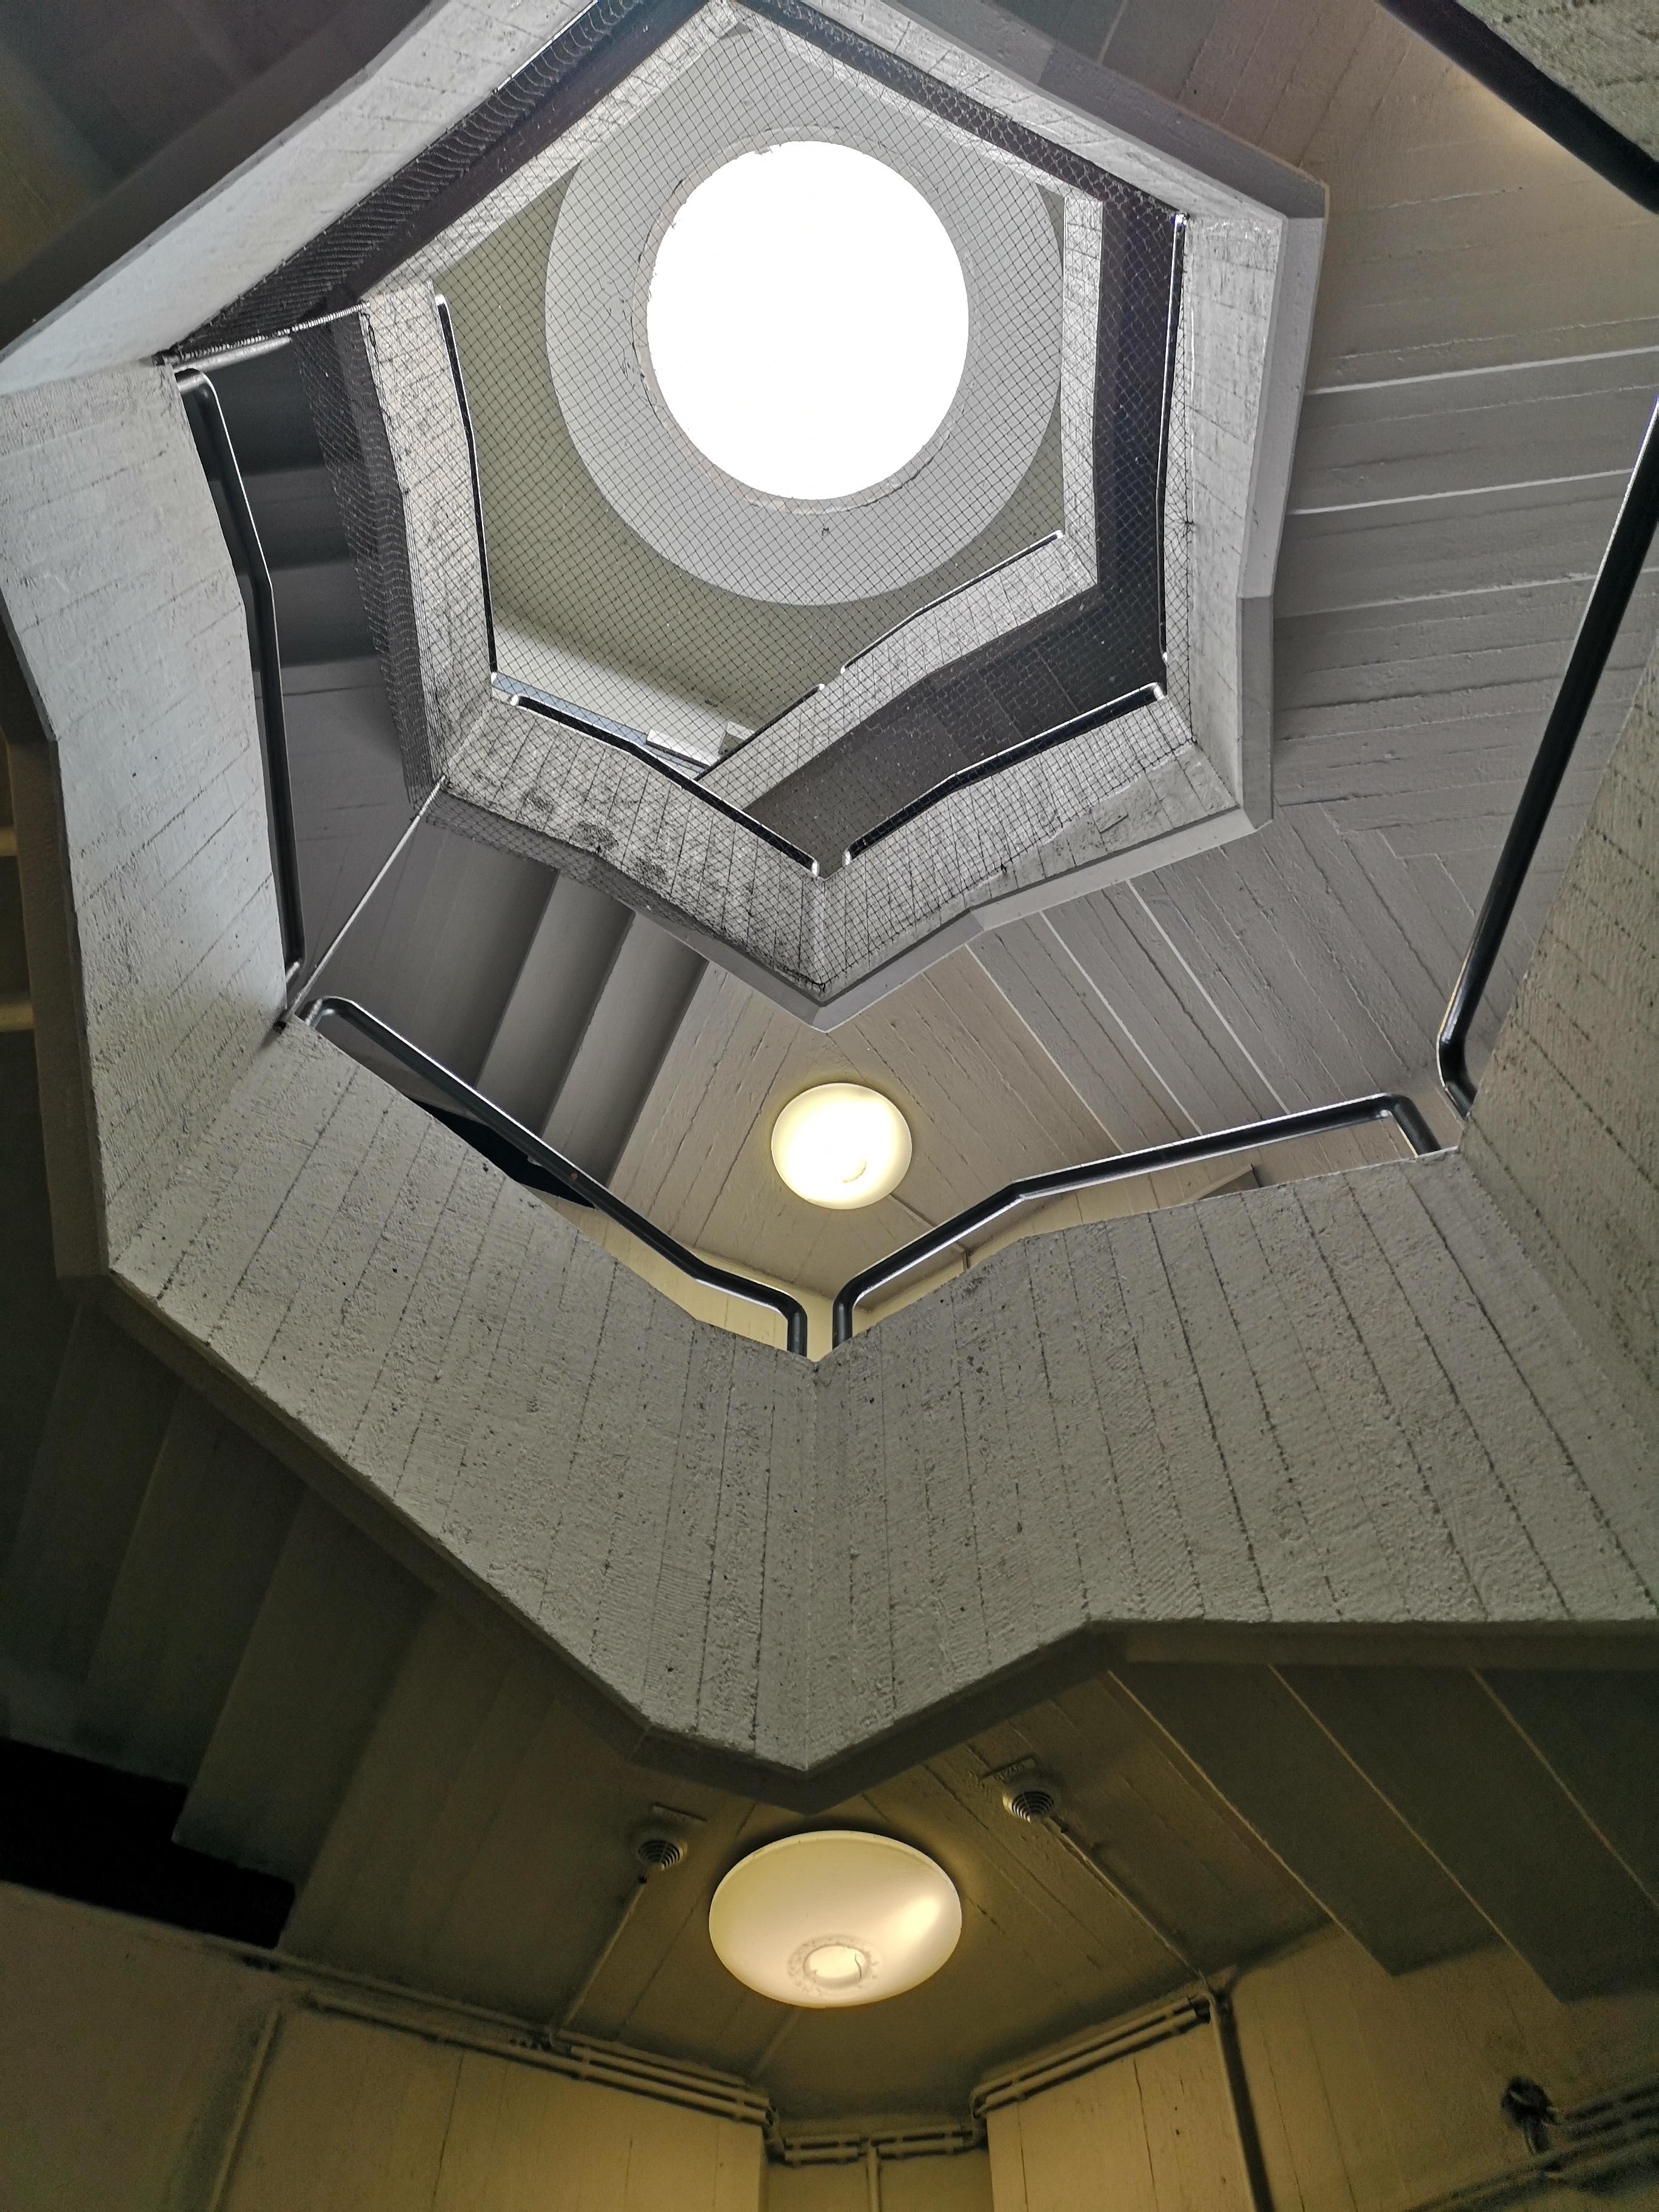 Flughafen-Tegel-Berlin-Treppe Hausflur